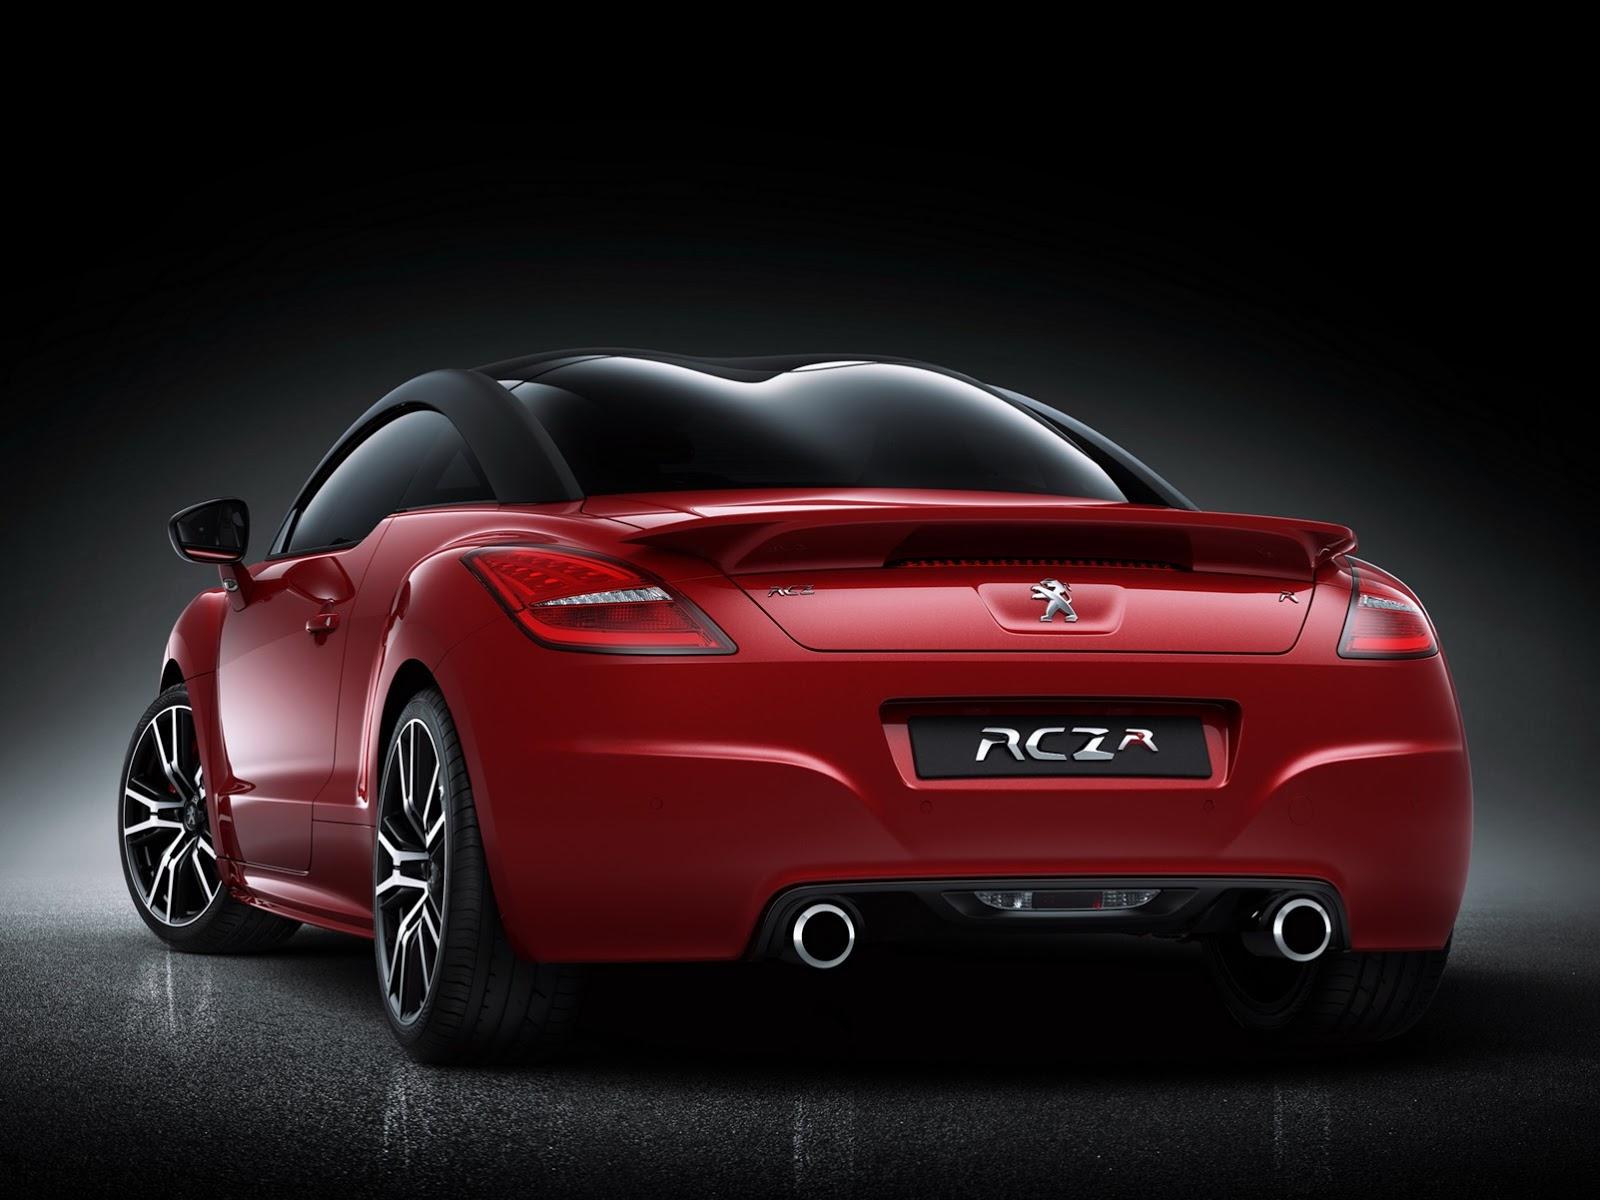 2014-Peugeot-RCZ-R-4%25255B4%25255D.jpg